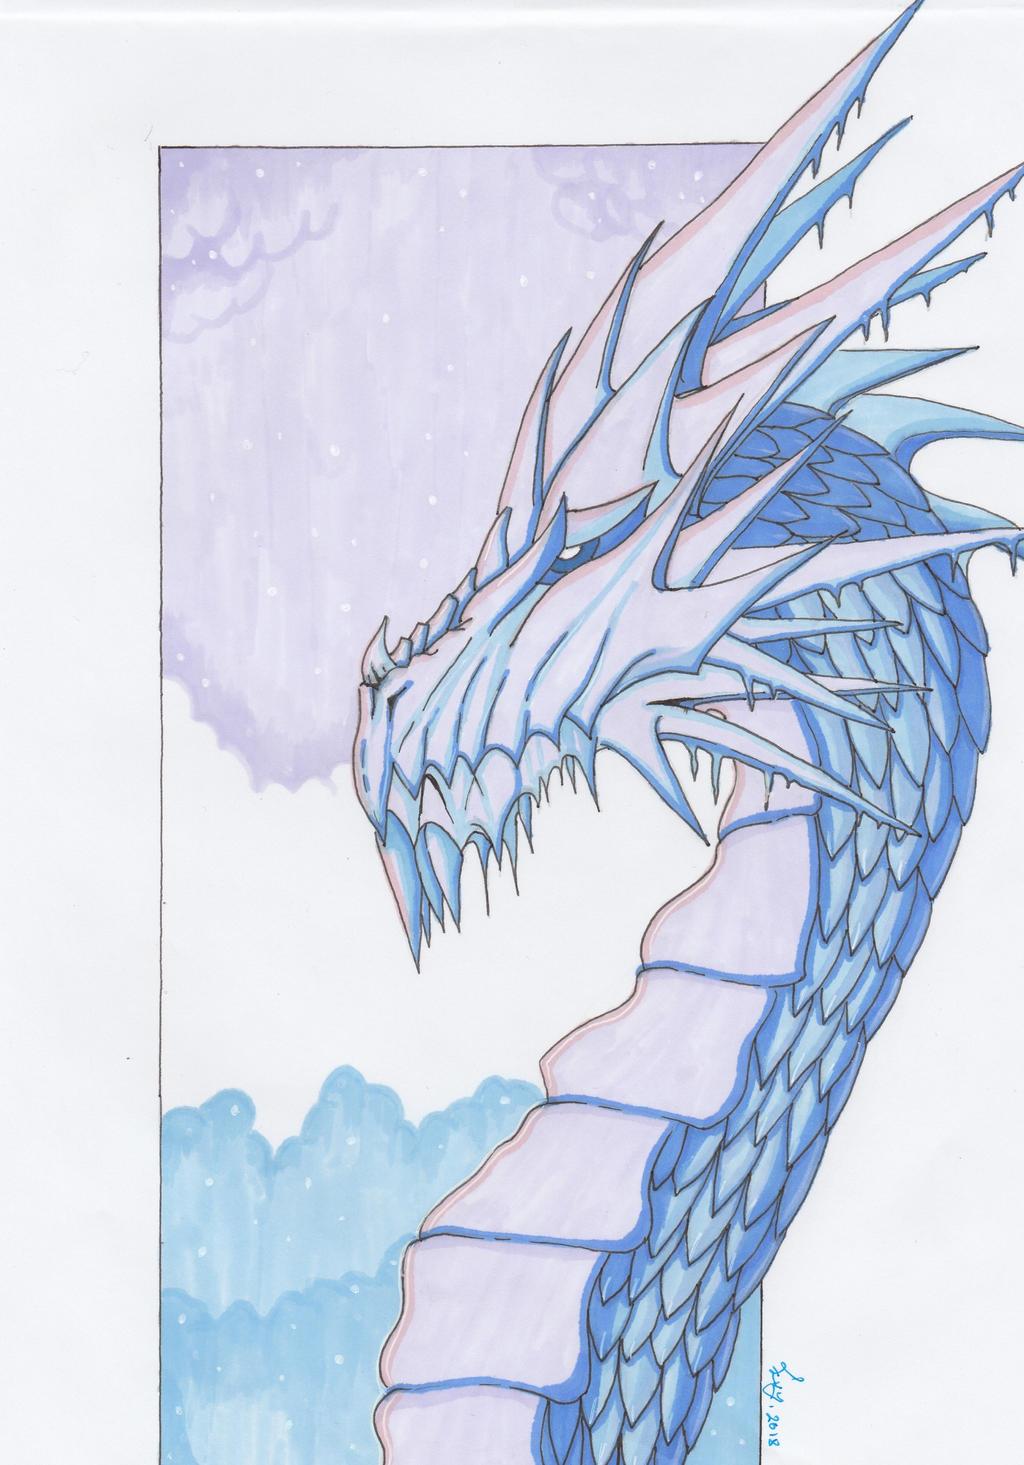 Ice dragon by getupp